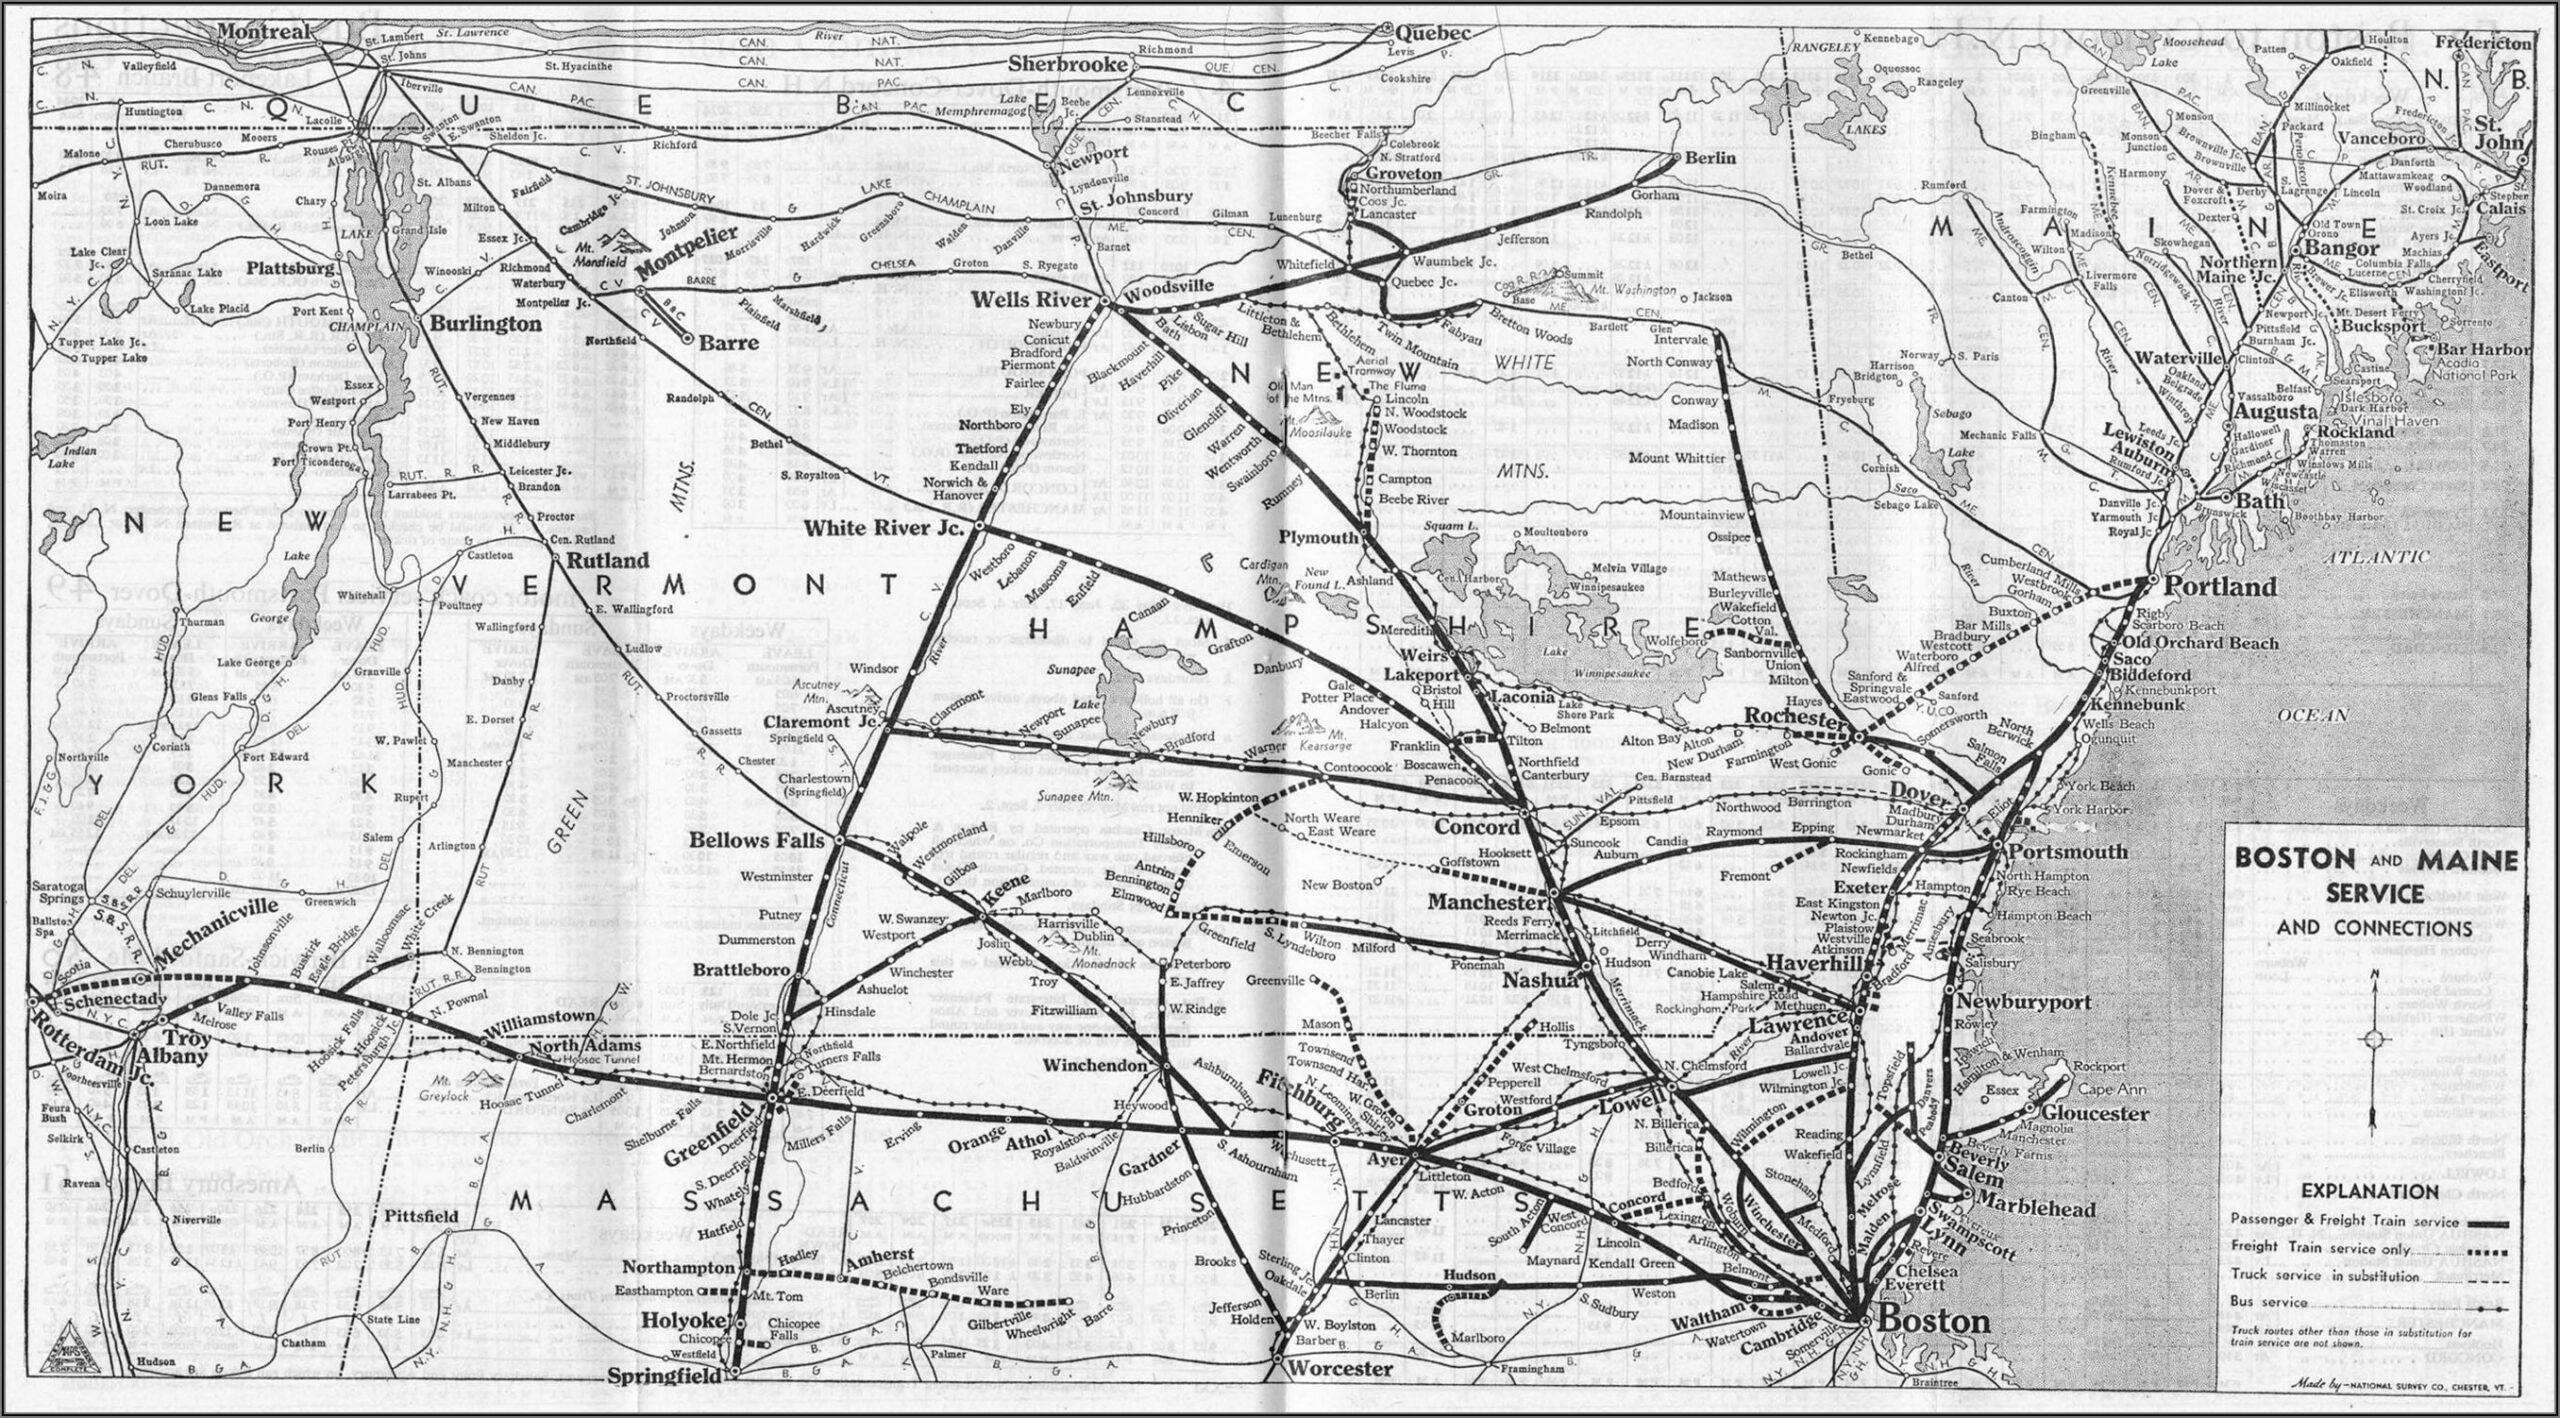 Mbta Commuter Rail Map Worcester Line